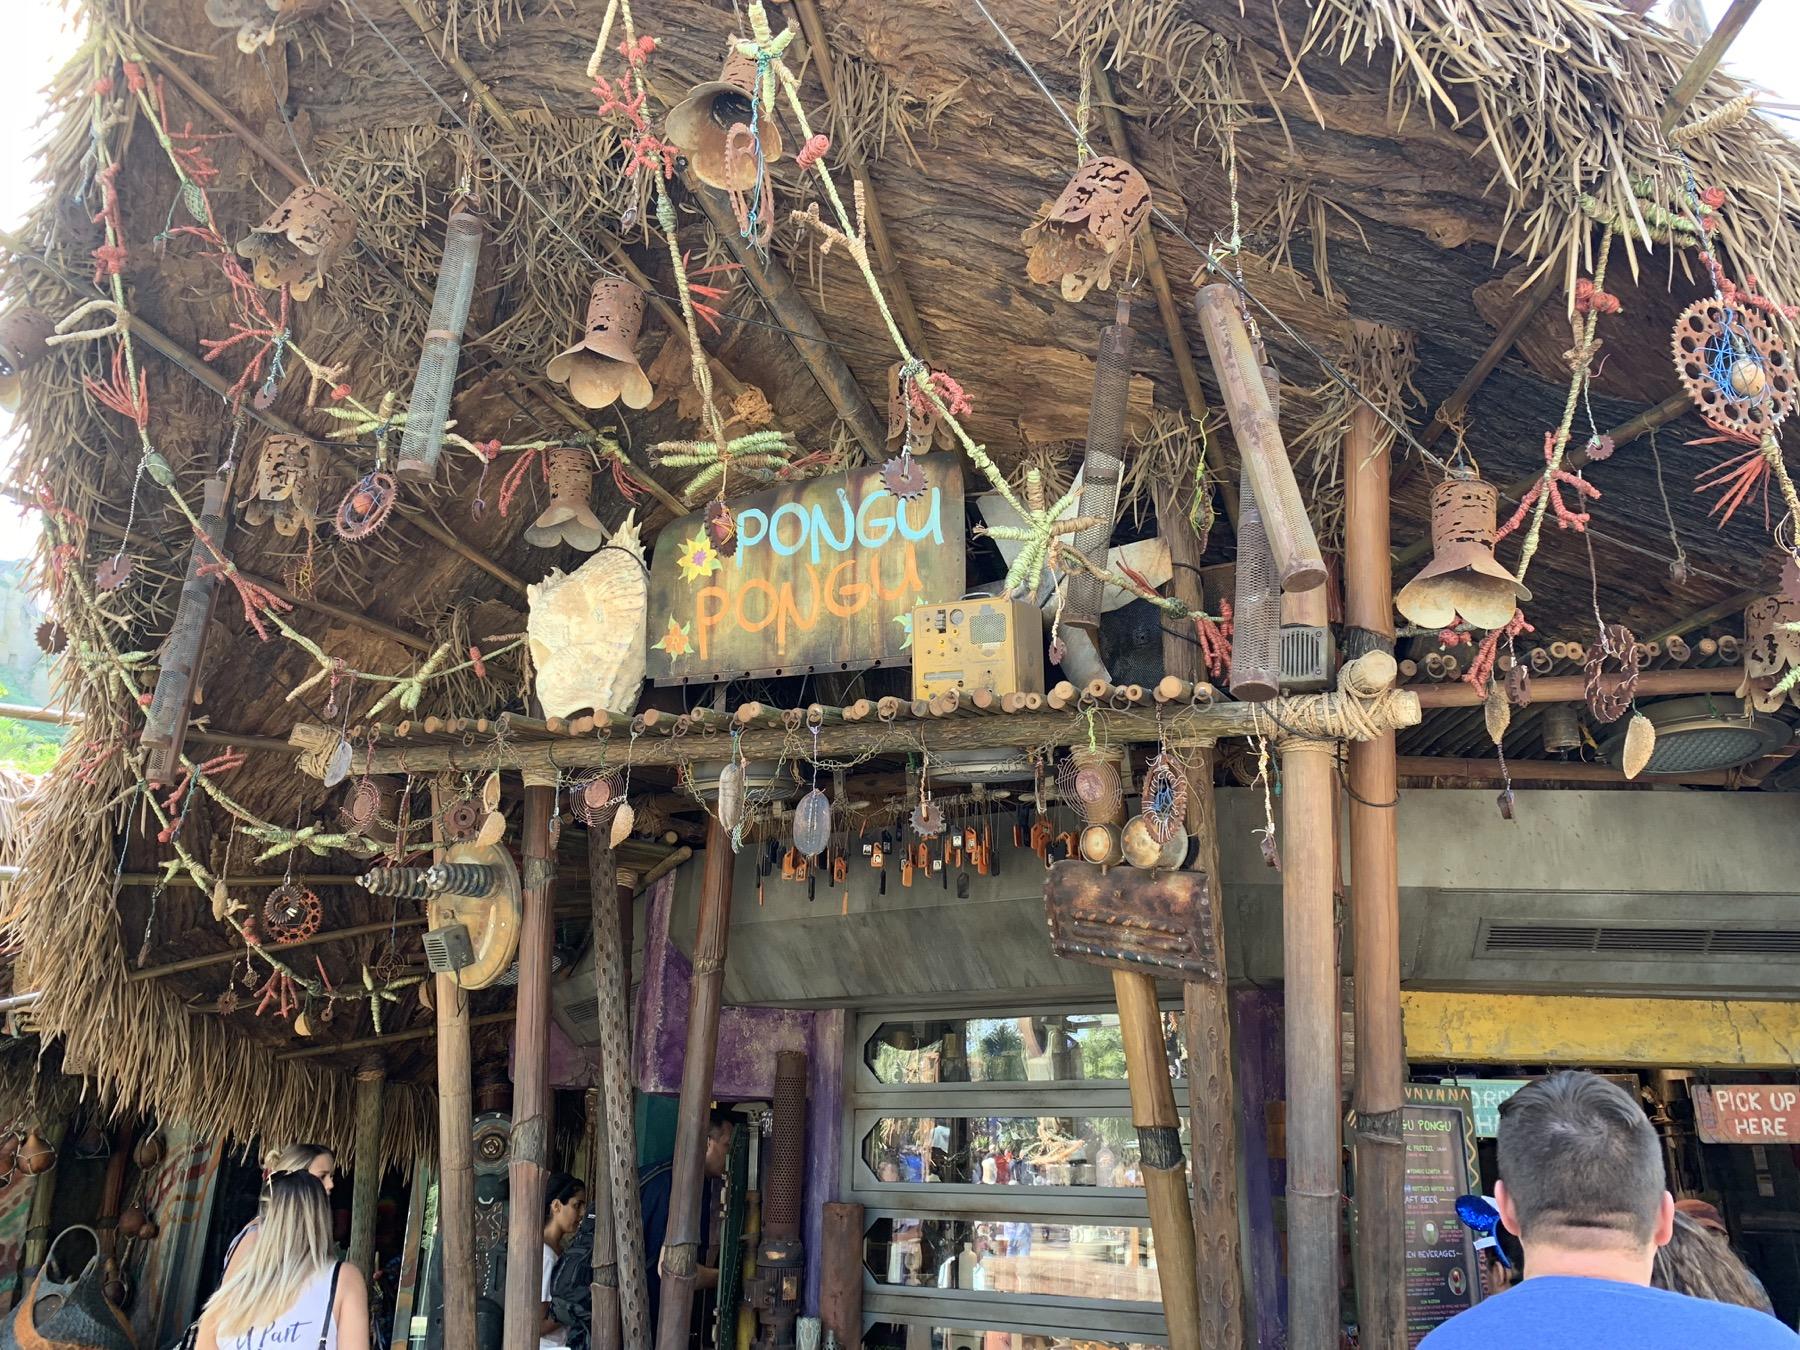 pongu pongu where to drink at animal kingdom.jpg